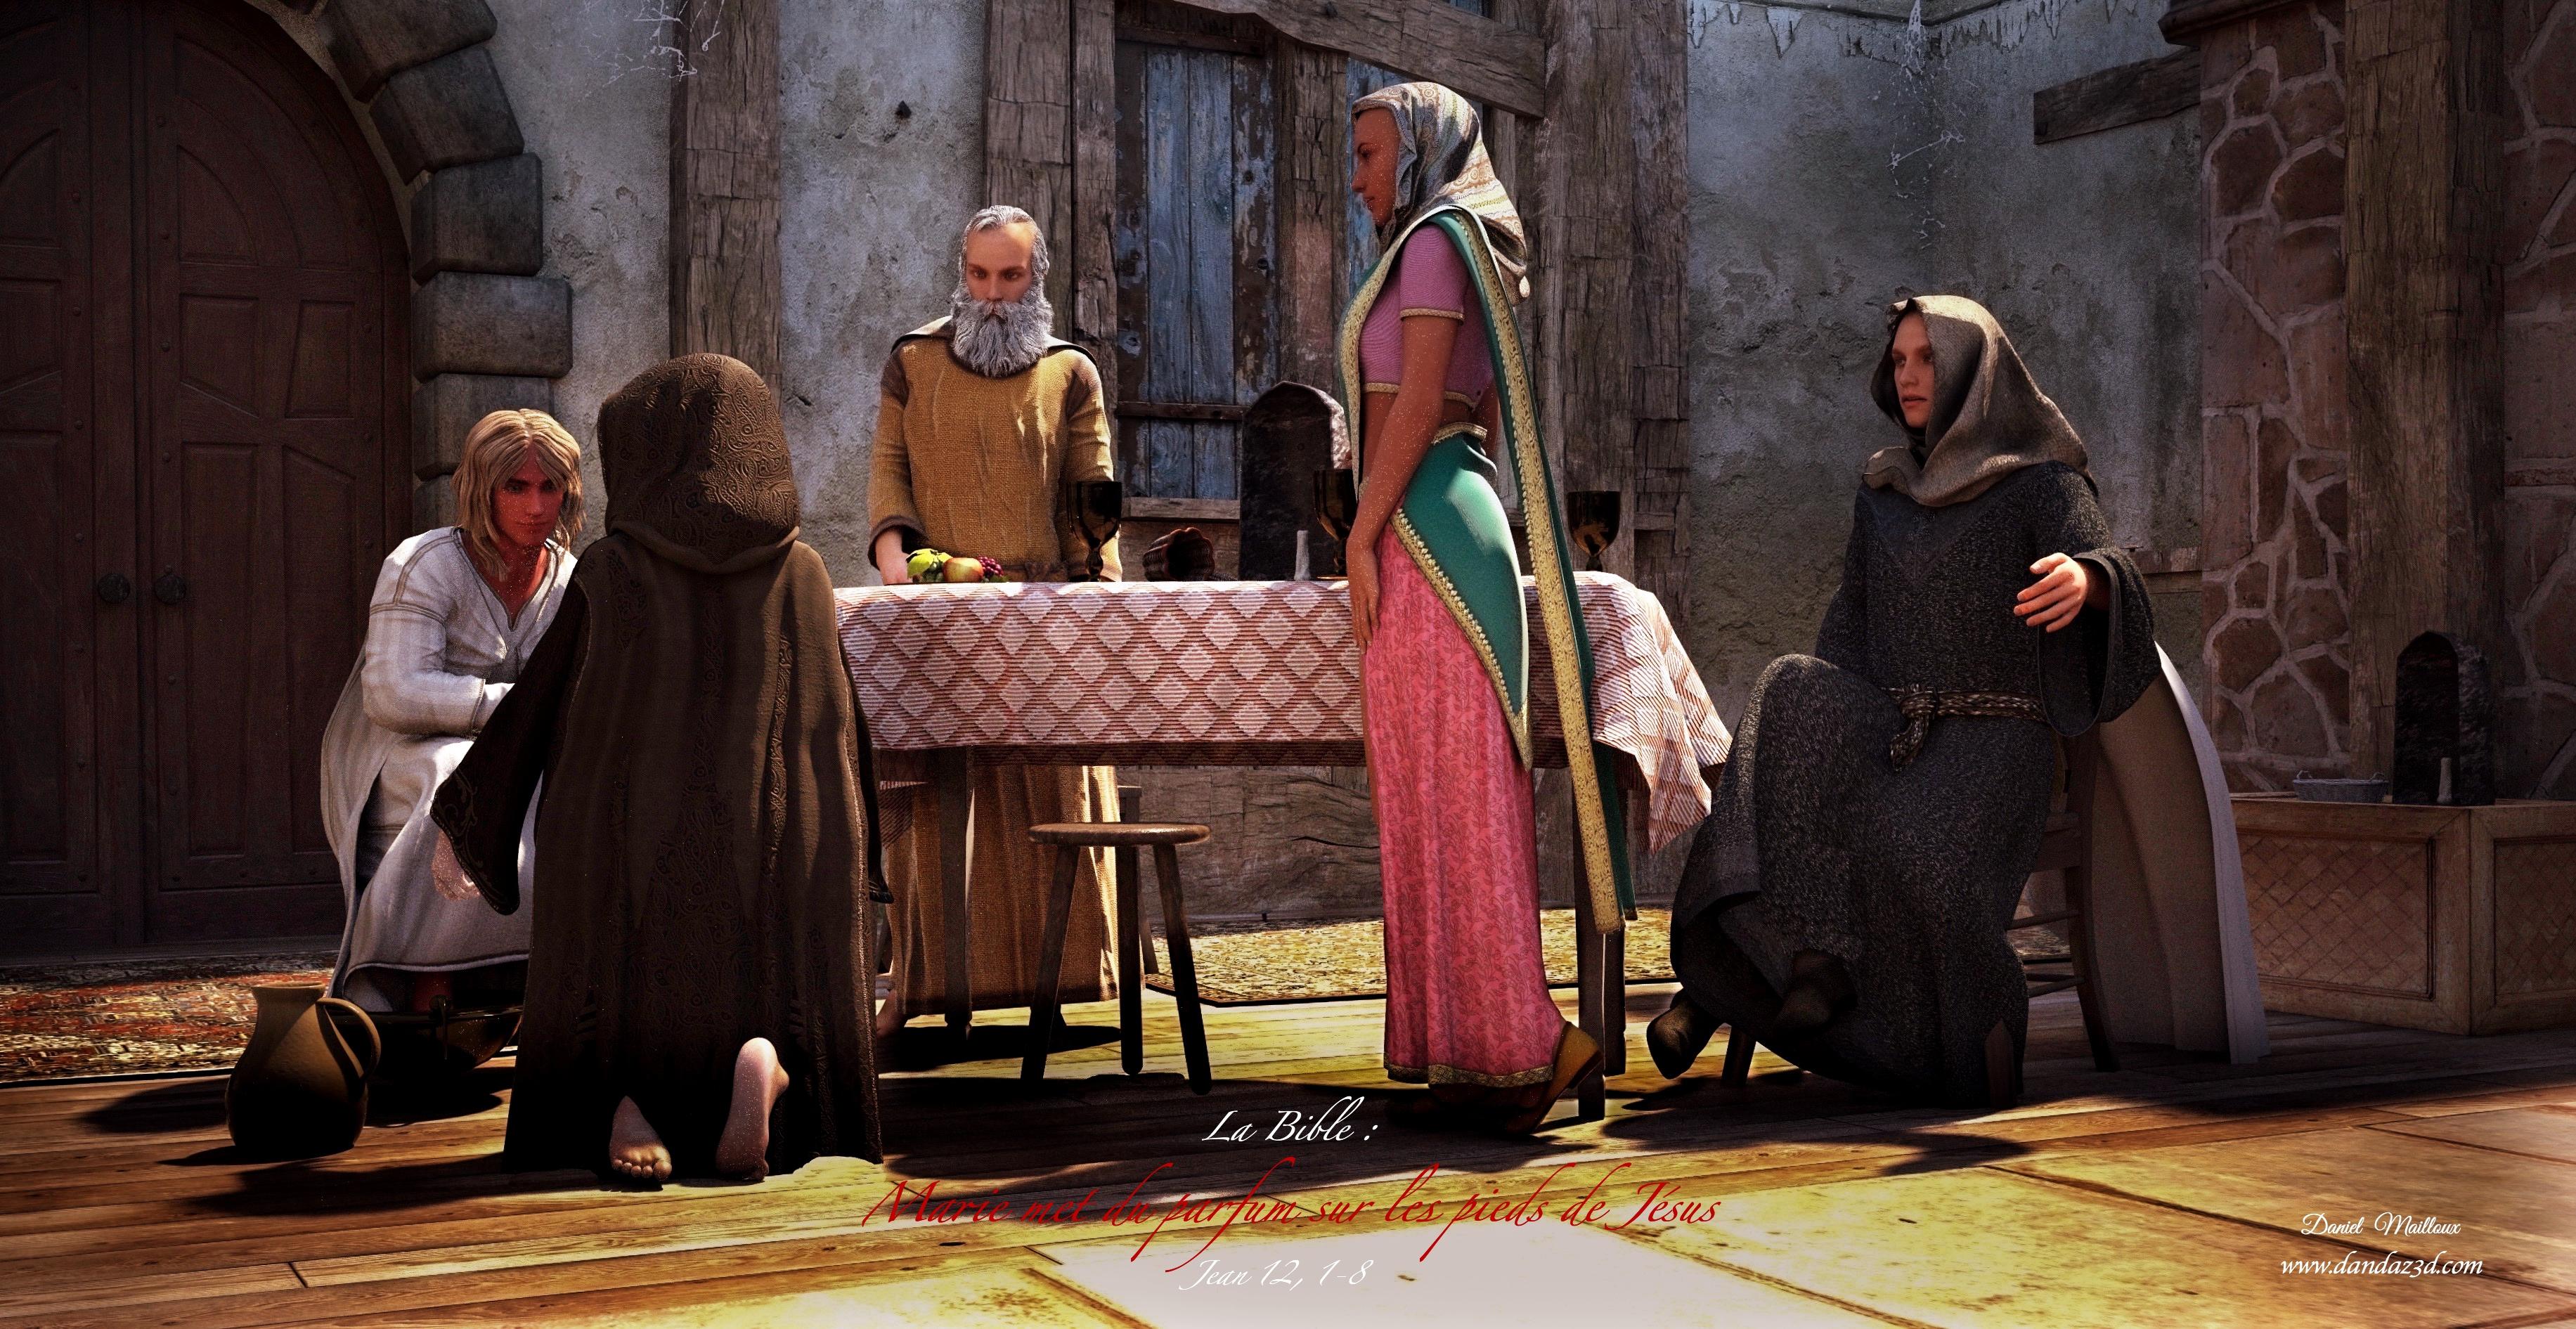 Marie met du parfum pieds Jésus